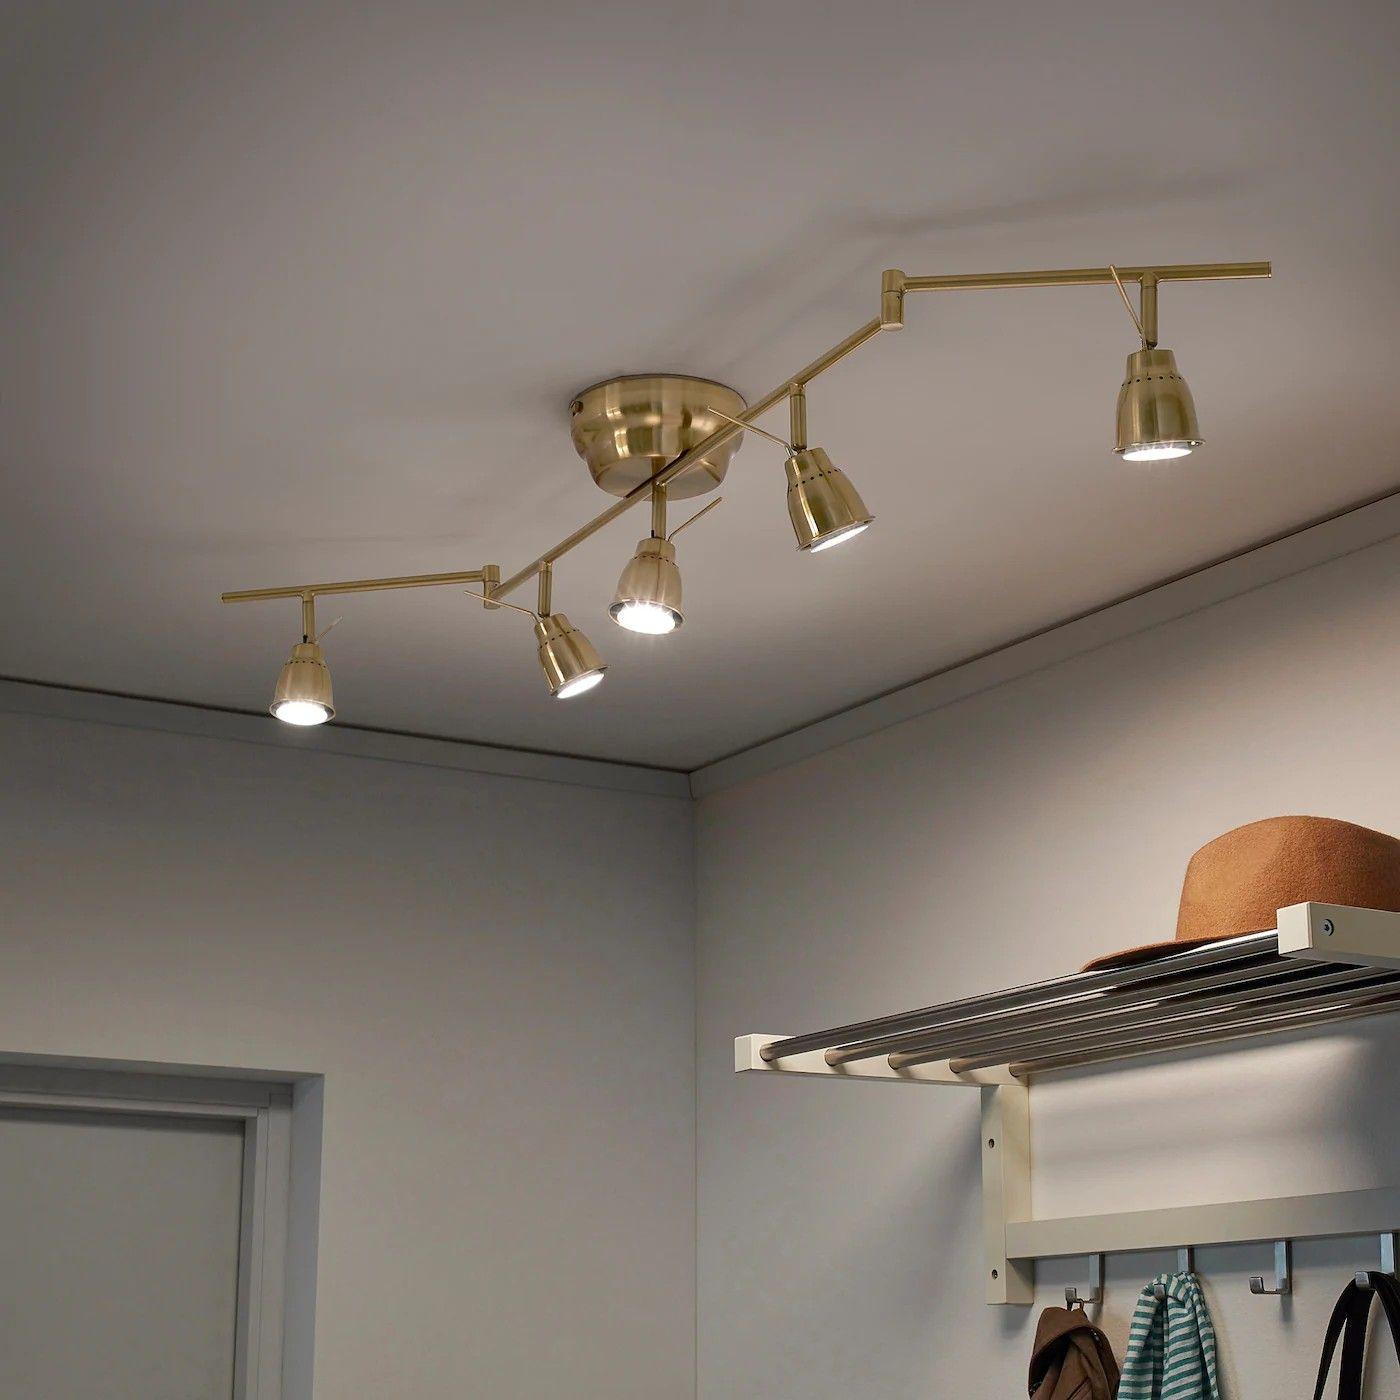 Pin By Boulanger On Salon Ceiling Track Track Lighting Living Room Kitchen Spotlights